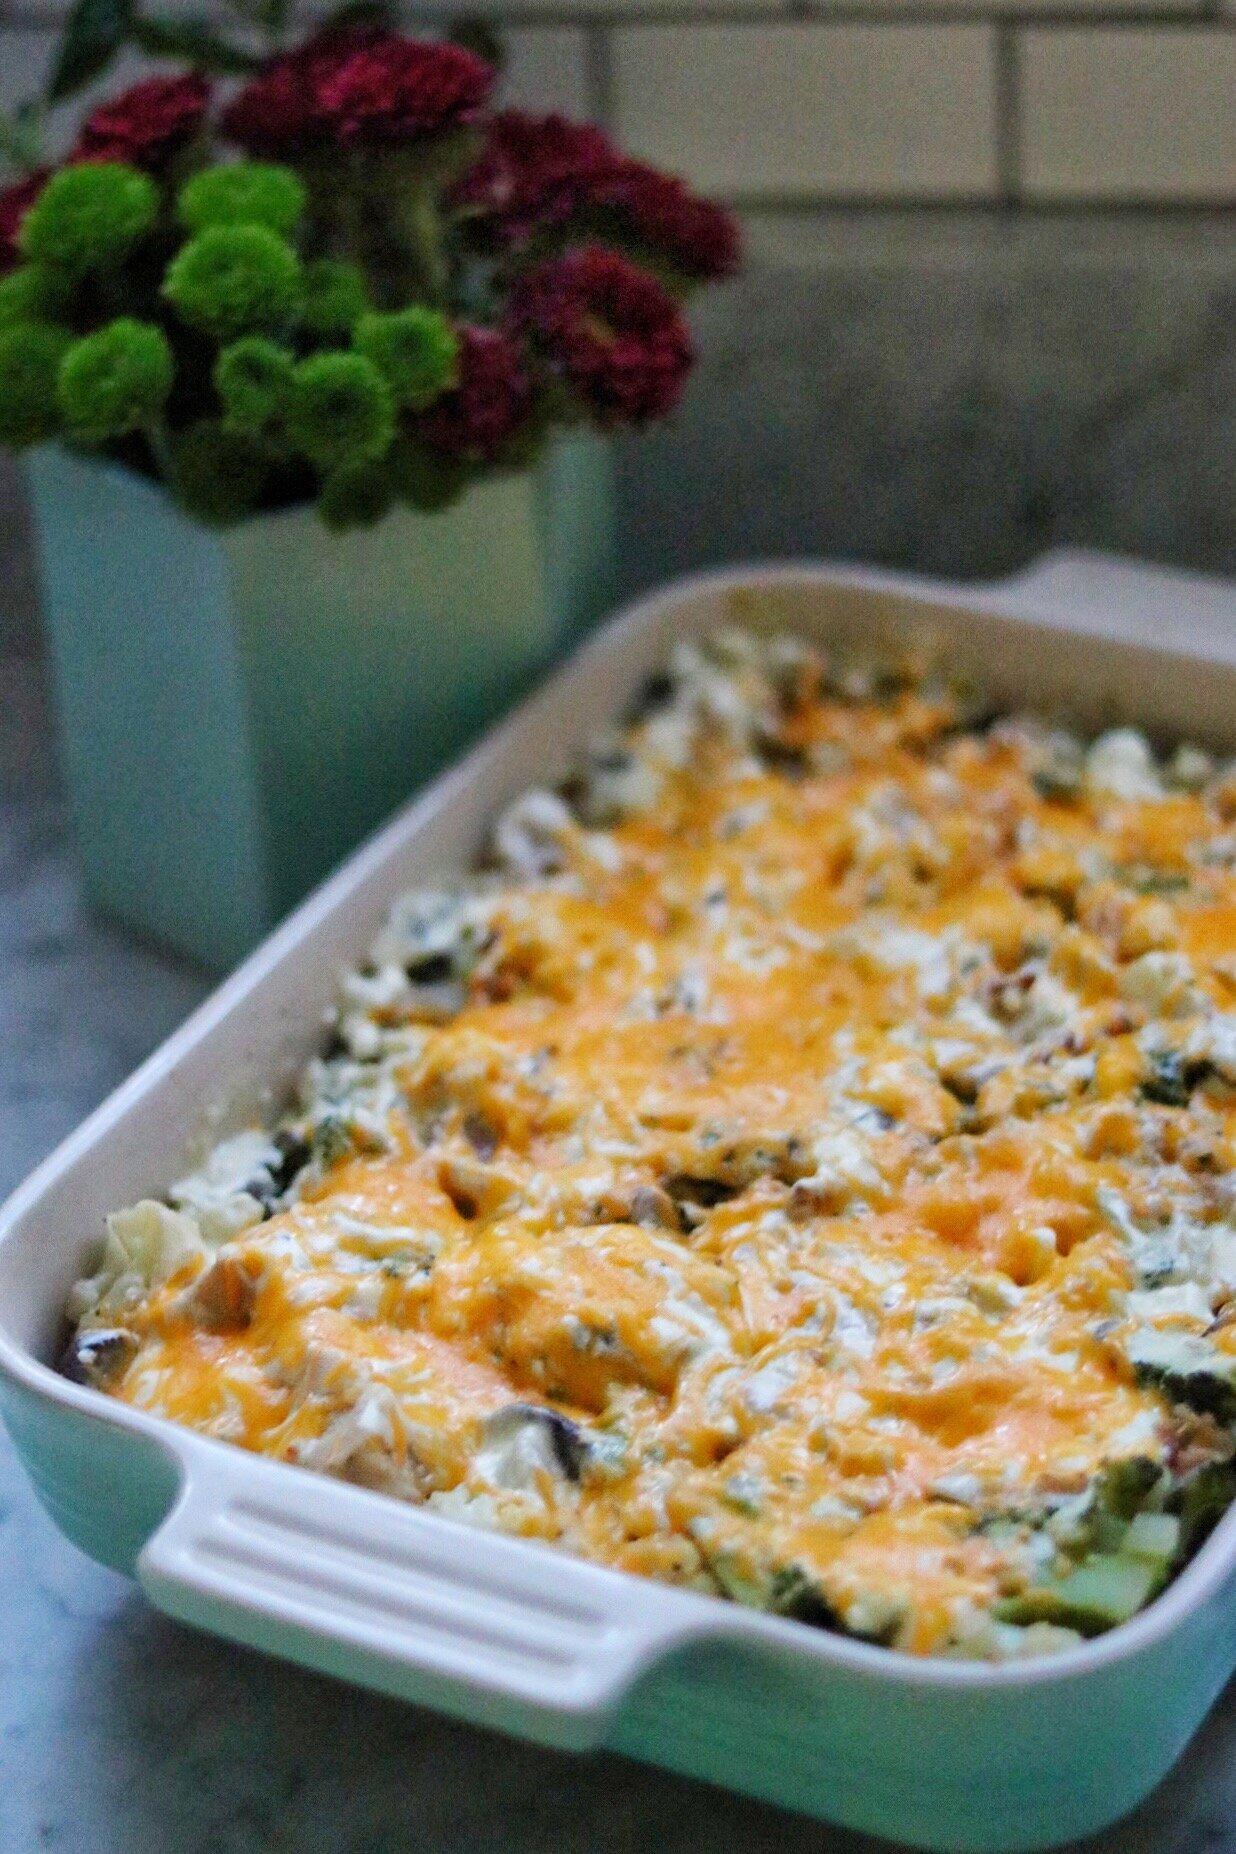 keto creamy chicken and vegetable bake recipe